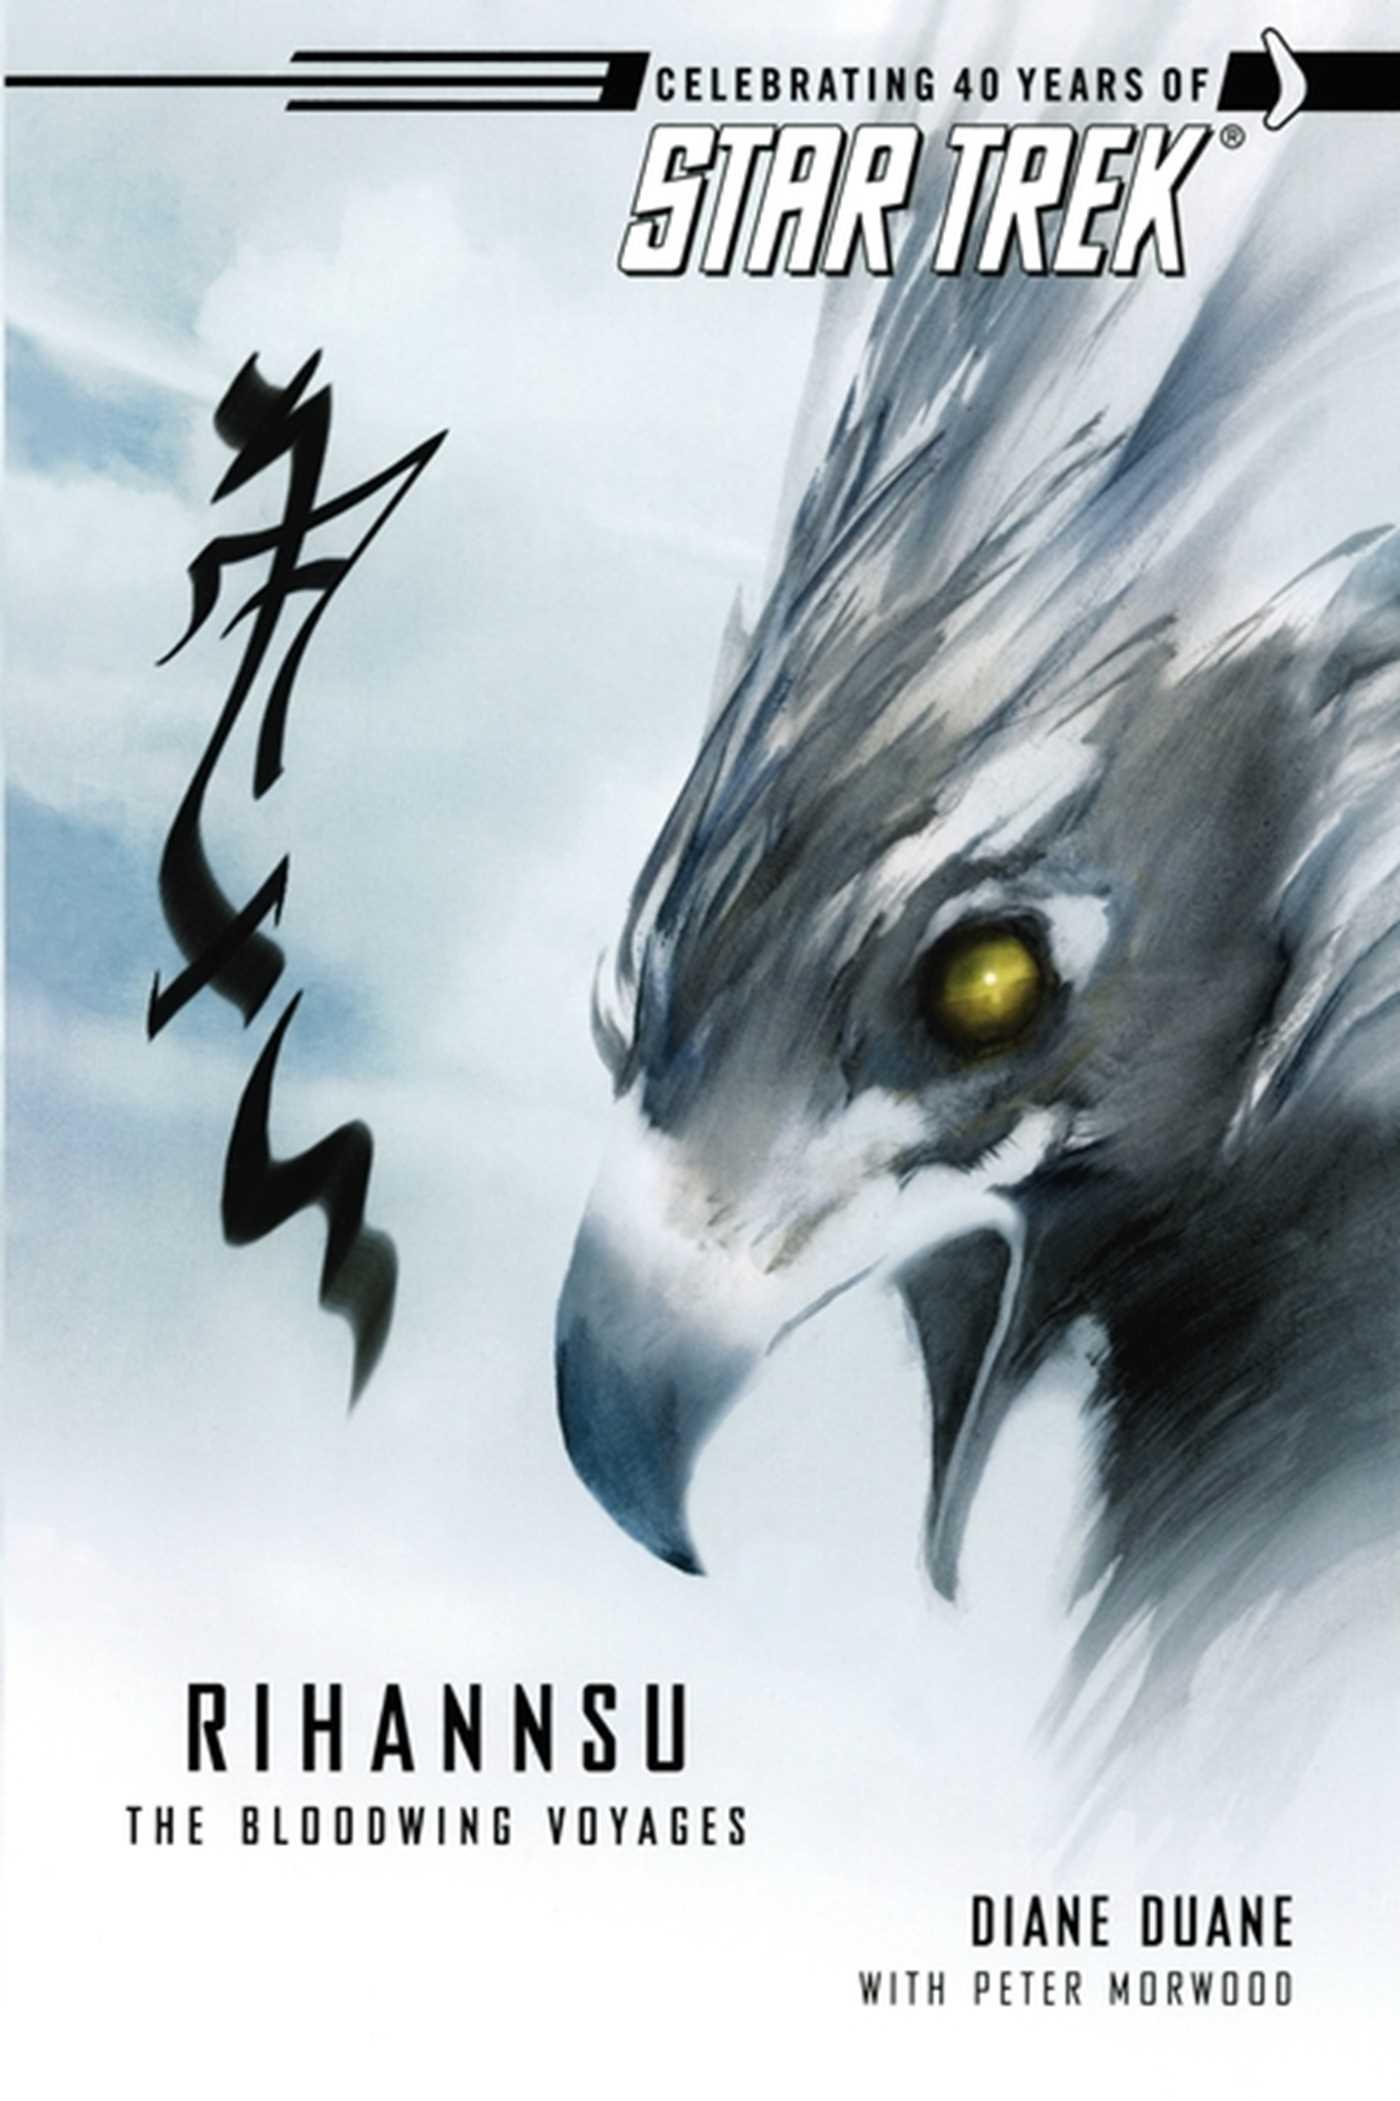 Star trek the original series rihannsu the bloodwing voyages 9781416531098 hr